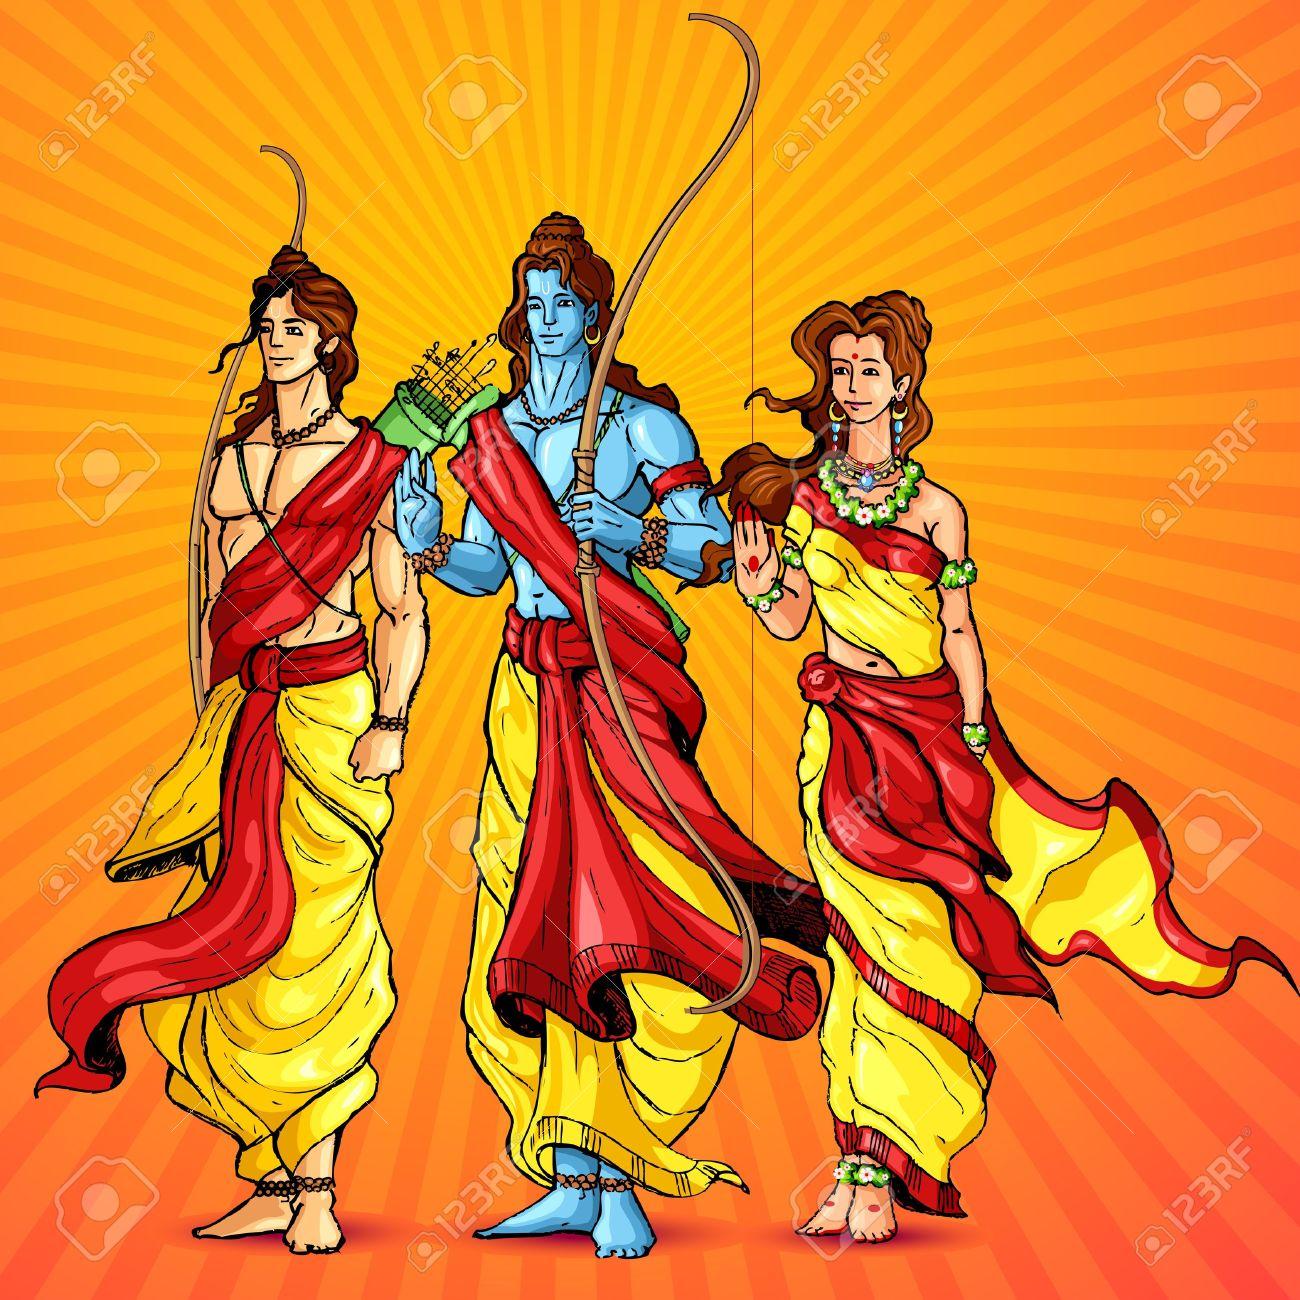 Ramayana images clipart.